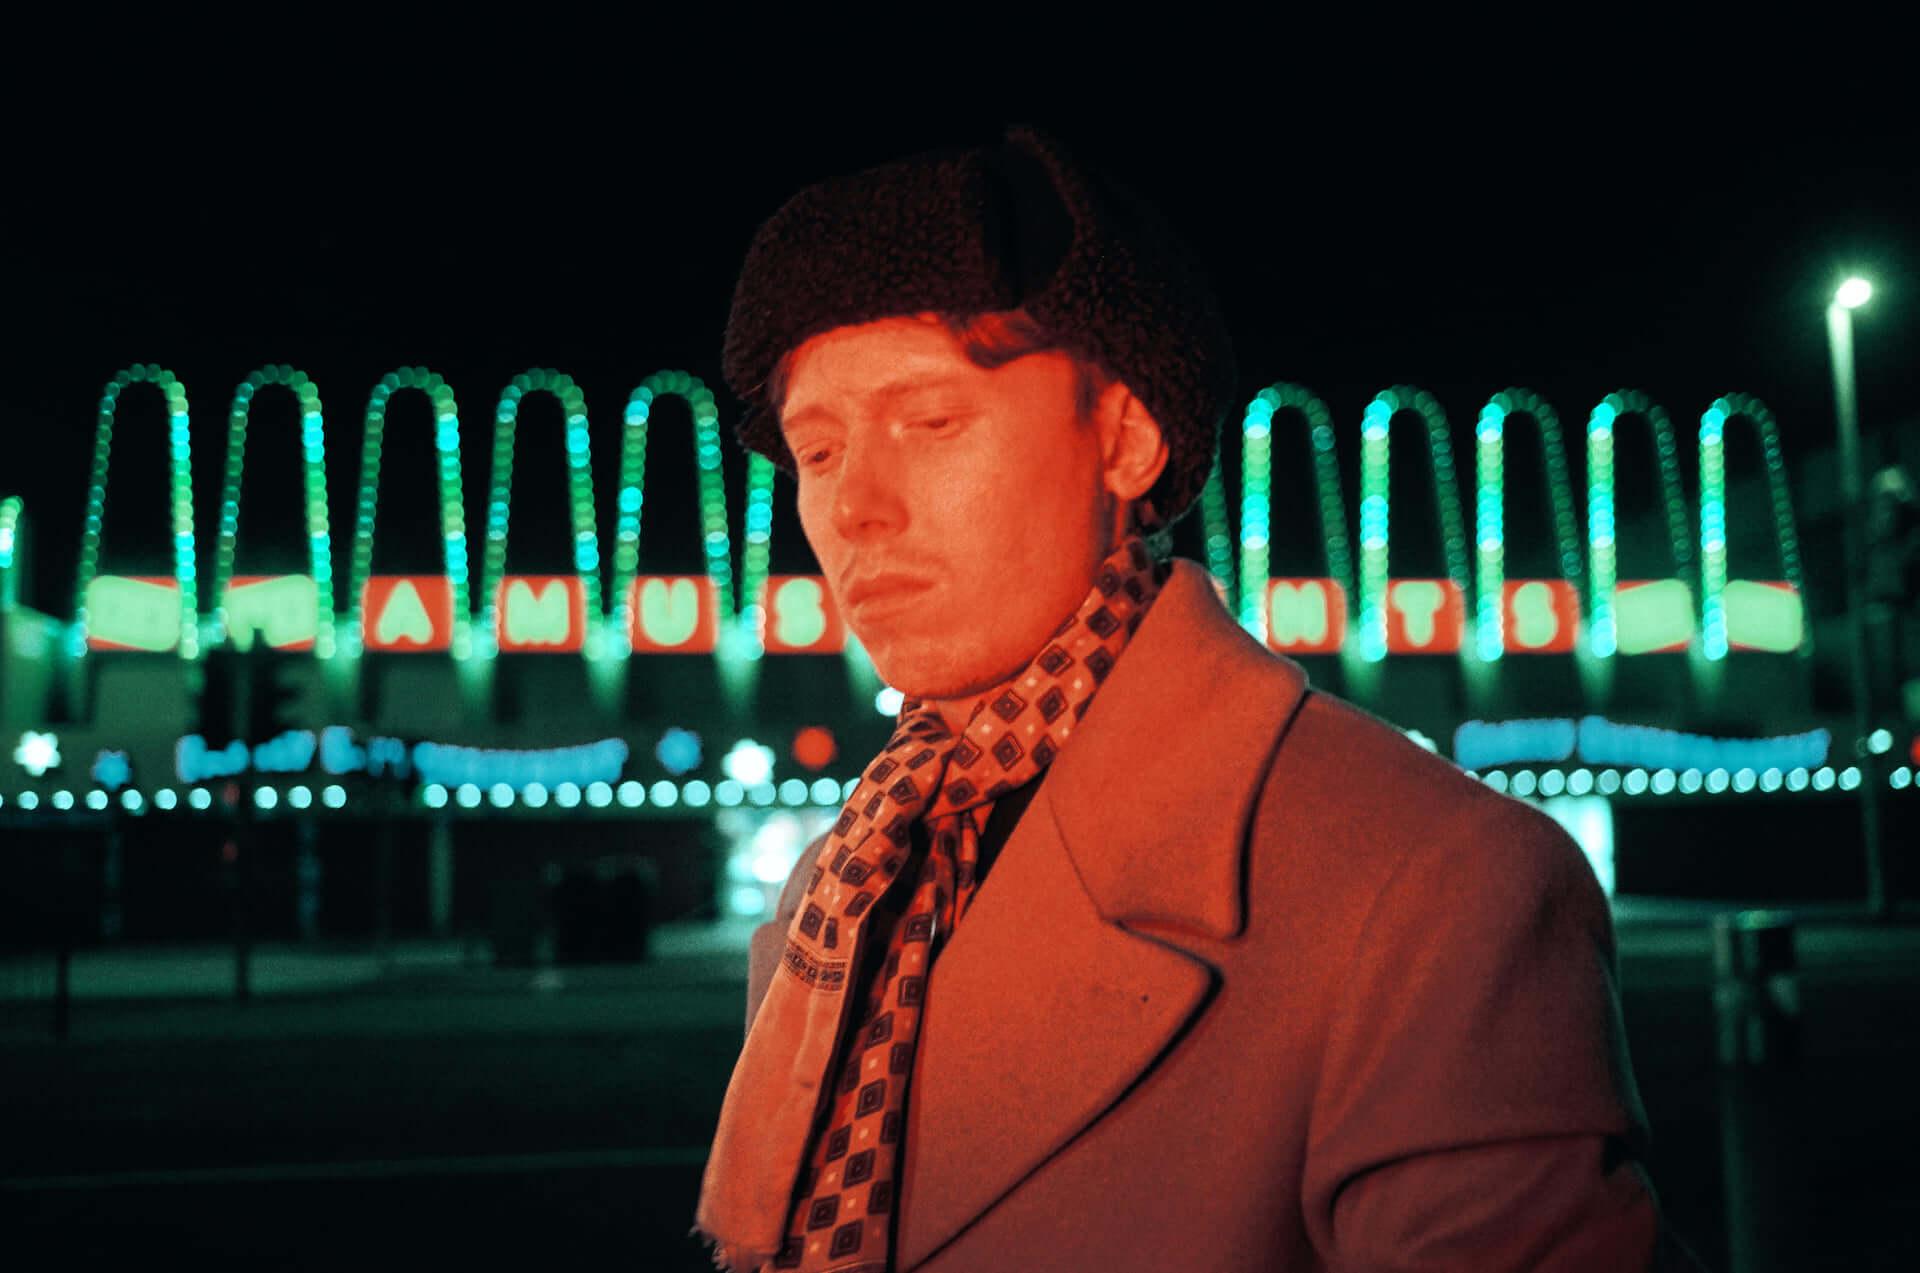 King Kruleが32分にわたるライブ映像を突如公開!最新アルバム収録曲含め計8曲をフルバンド演奏 music200408_kingkrule_2-1920x1273